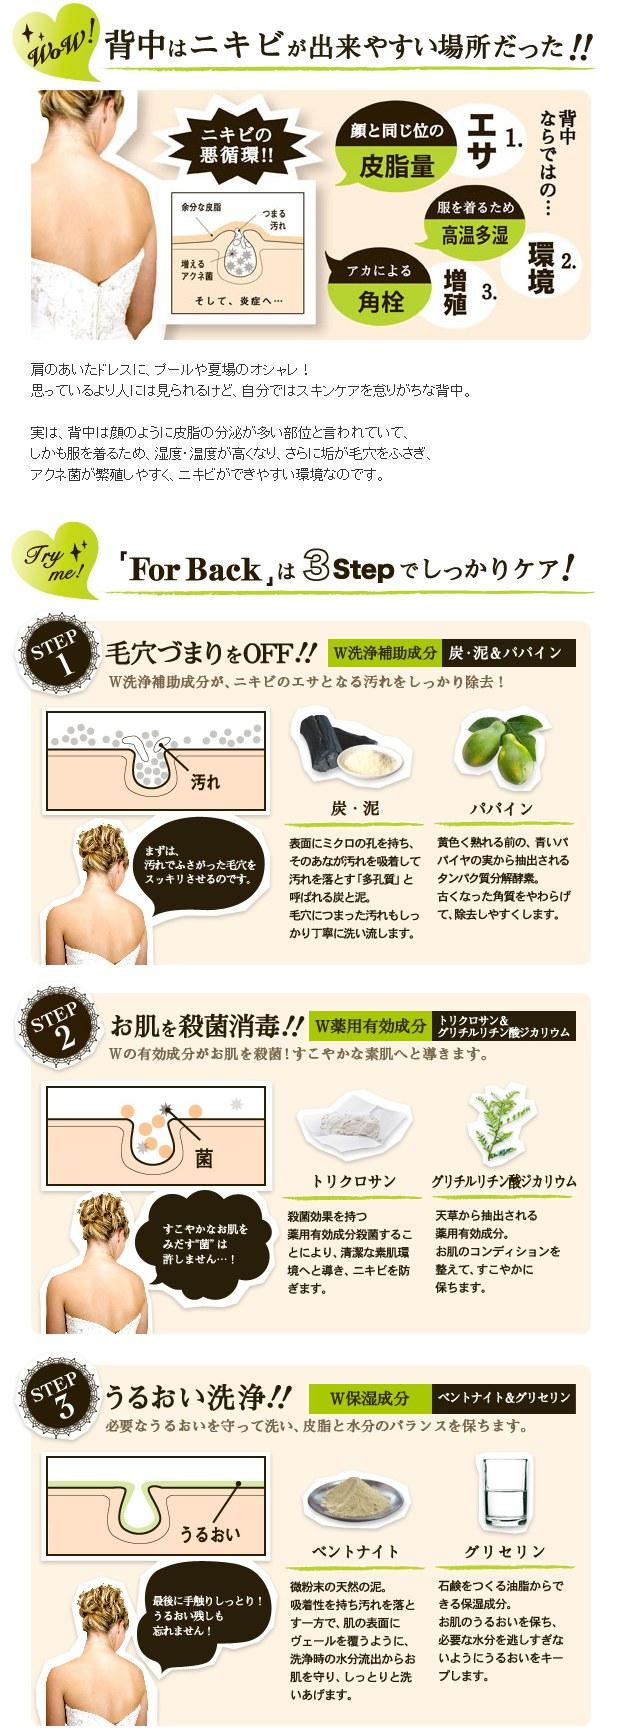 For Back - 背部專用潔膚石鹼  - 135g